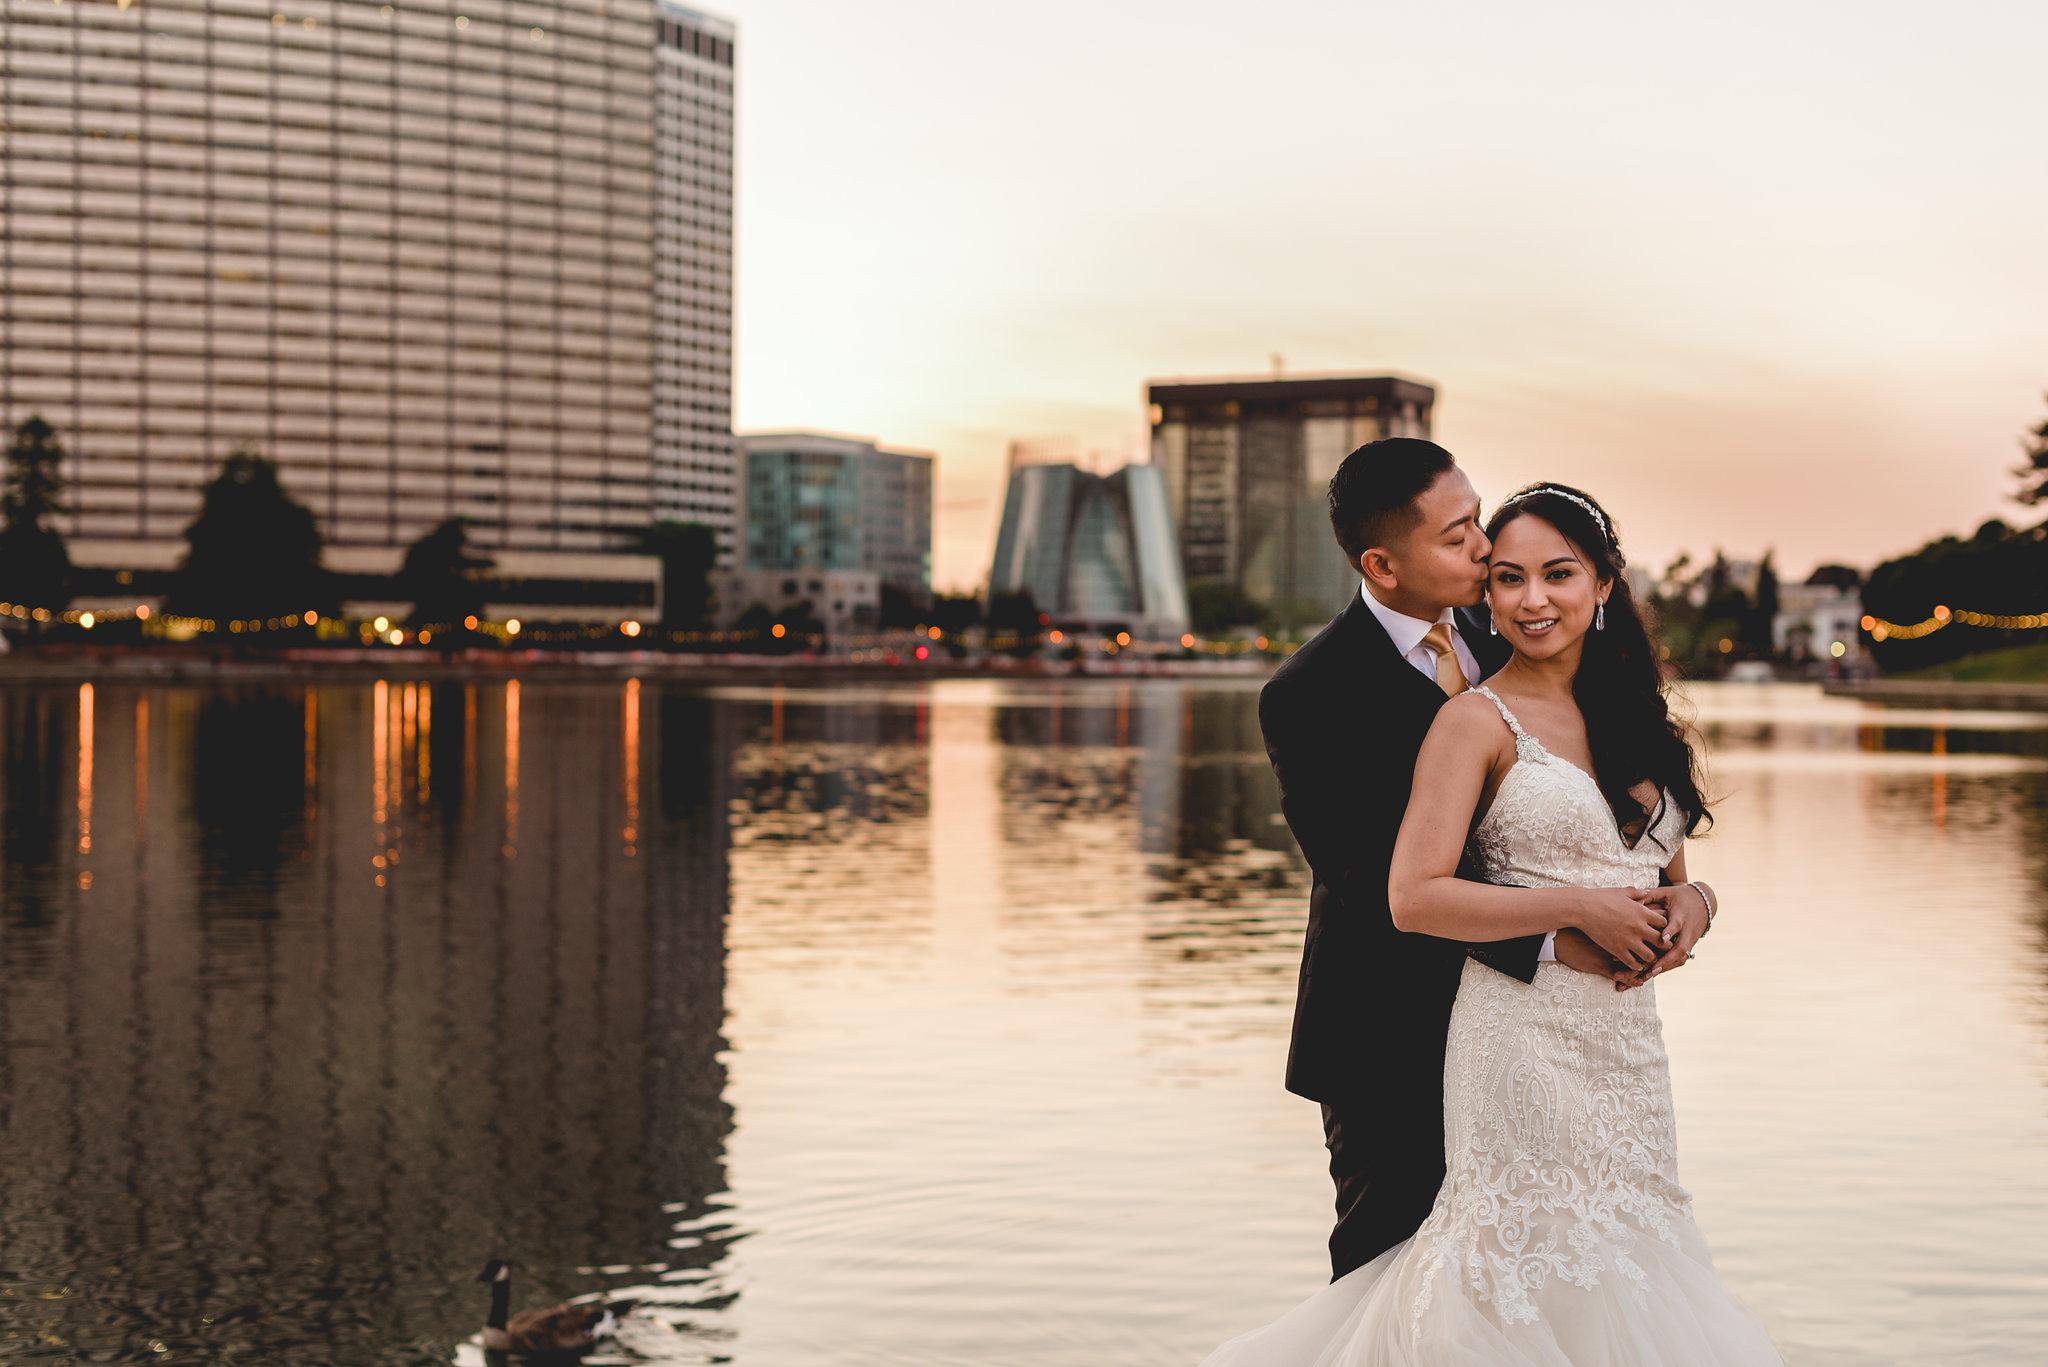 go_wedding-couple-95.jpg